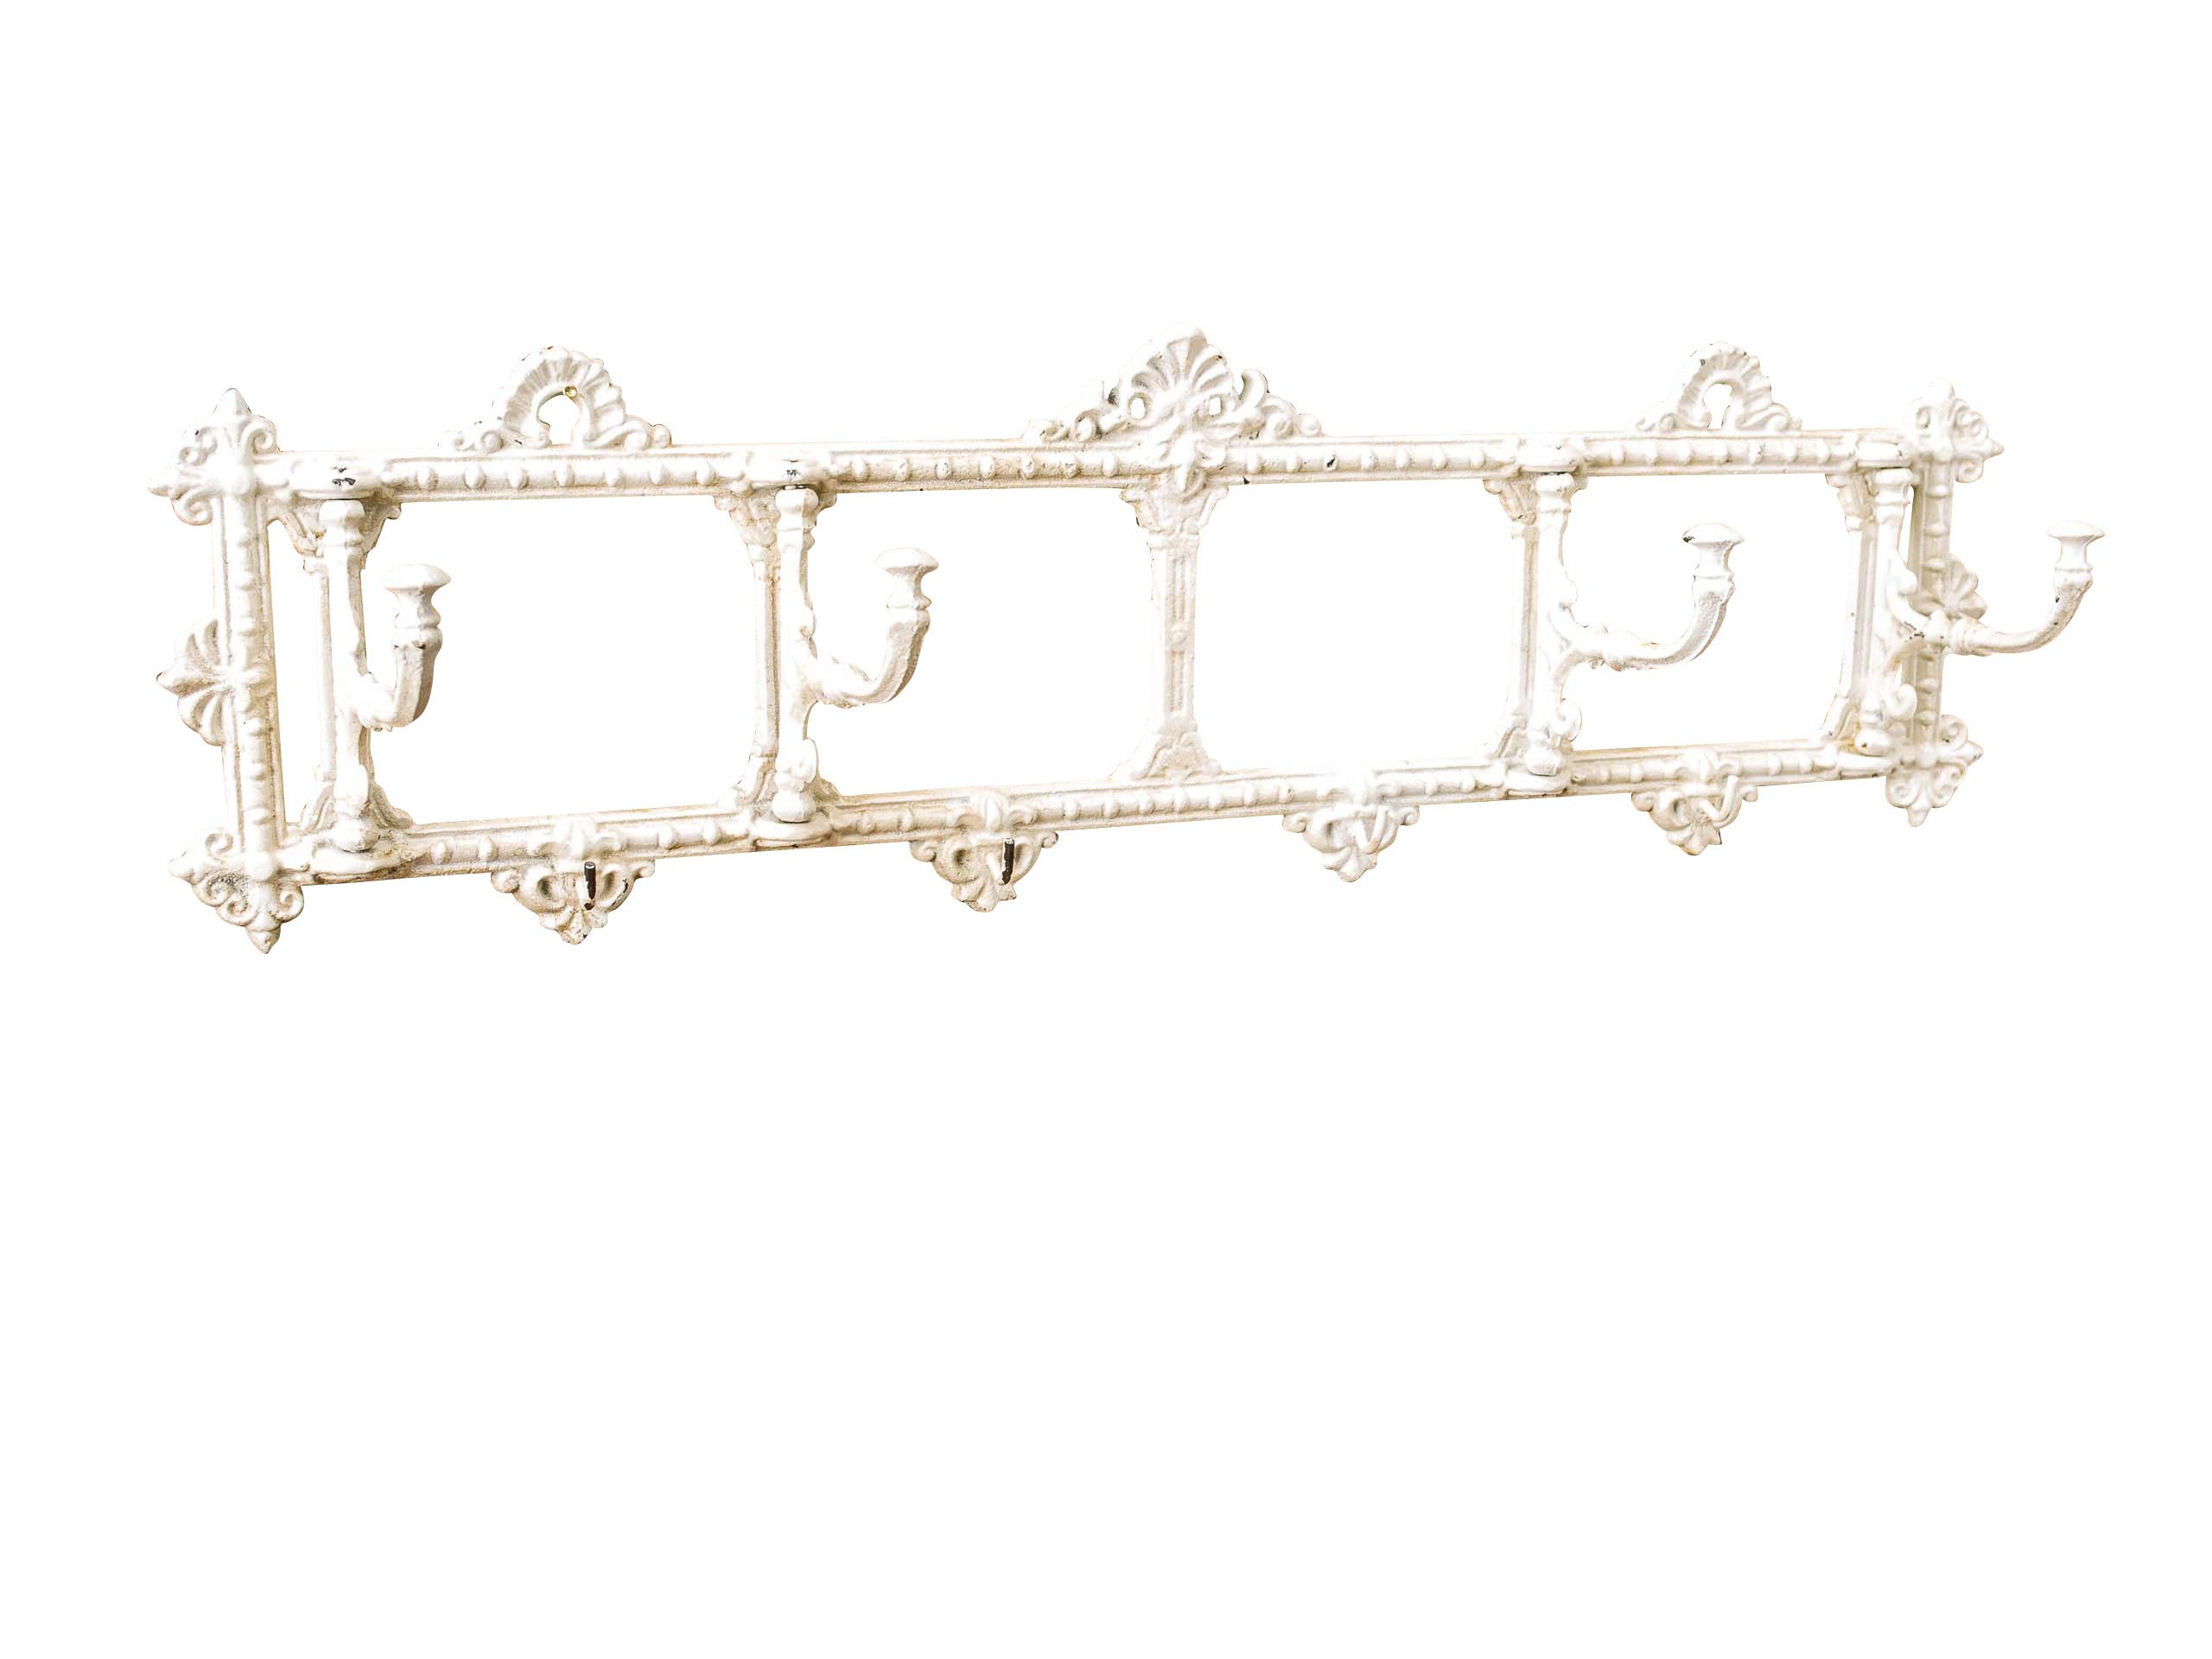 Wandgarderobe Garderobe Jugendstil antik Stil 63cm Kleiderhaken braun wardrobe Antiques Reproduction Arms./Wardrobes